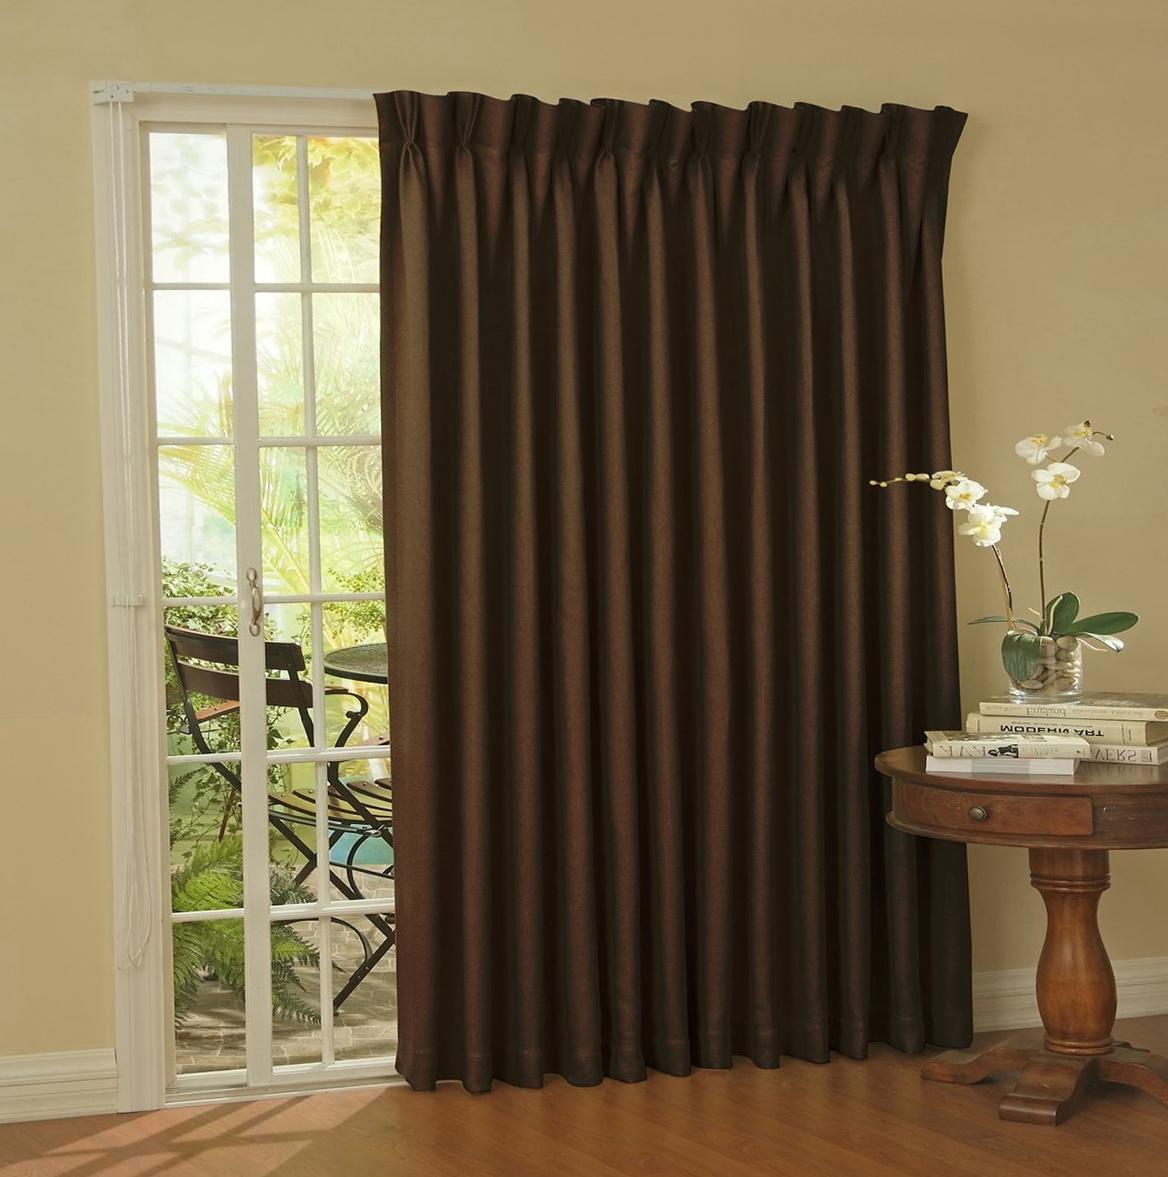 Noise Reducing Curtains Walmart Home Design Ideas